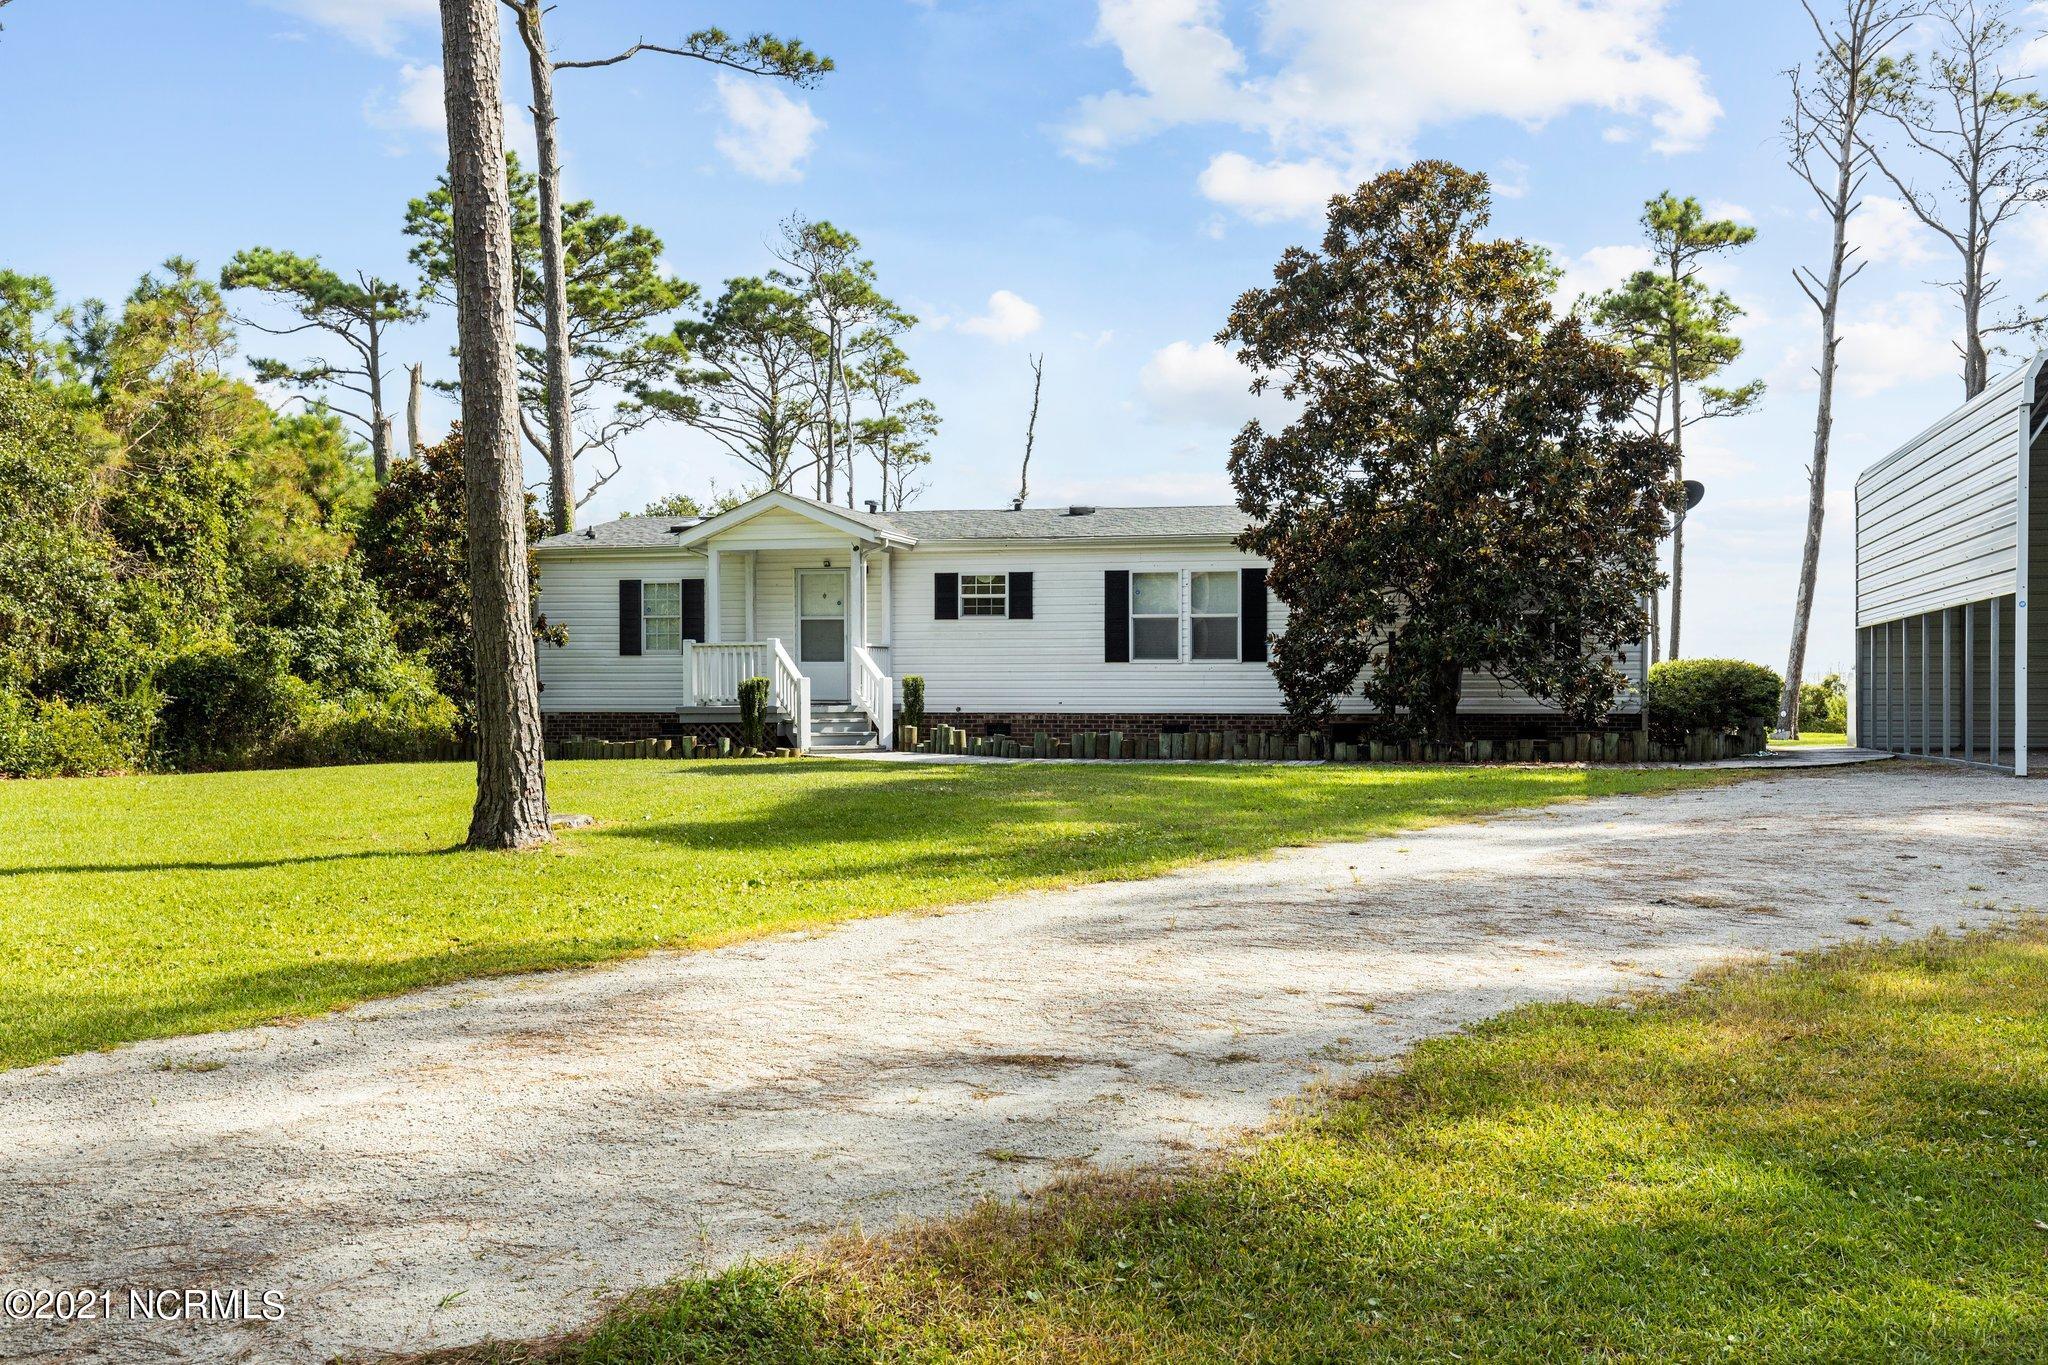 420 Seashore Drive, Atlantic, North Carolina 28511, 3 Bedrooms Bedrooms, 8 Rooms Rooms,2 BathroomsBathrooms,Manufactured home,For sale,Seashore,100286480